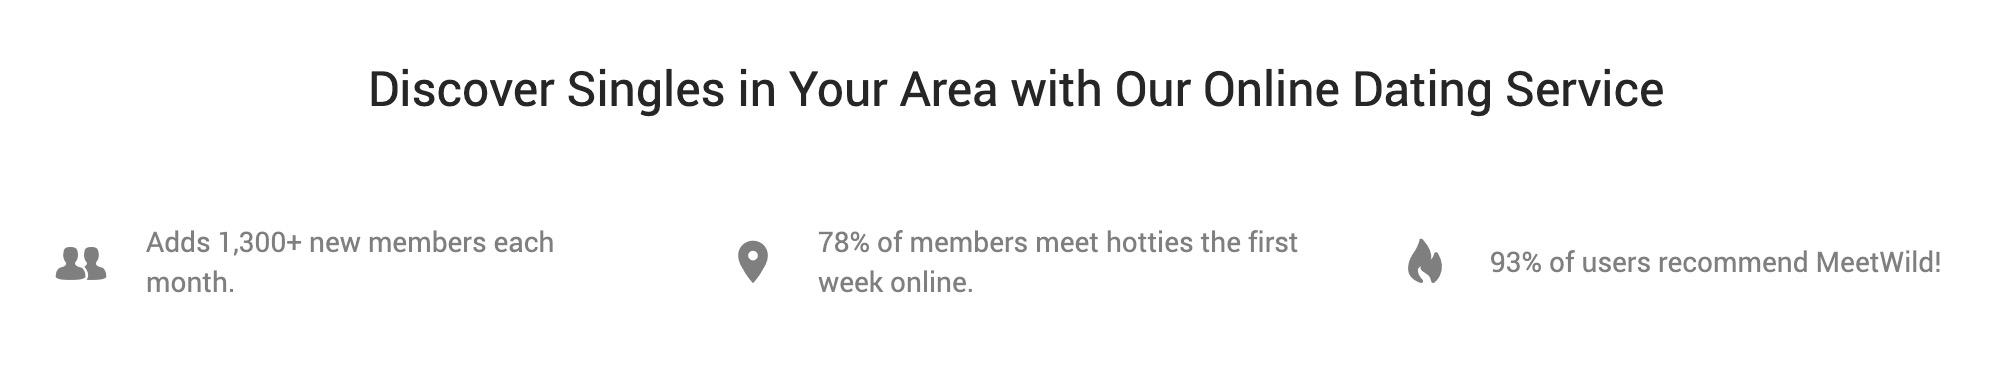 MeetWild features